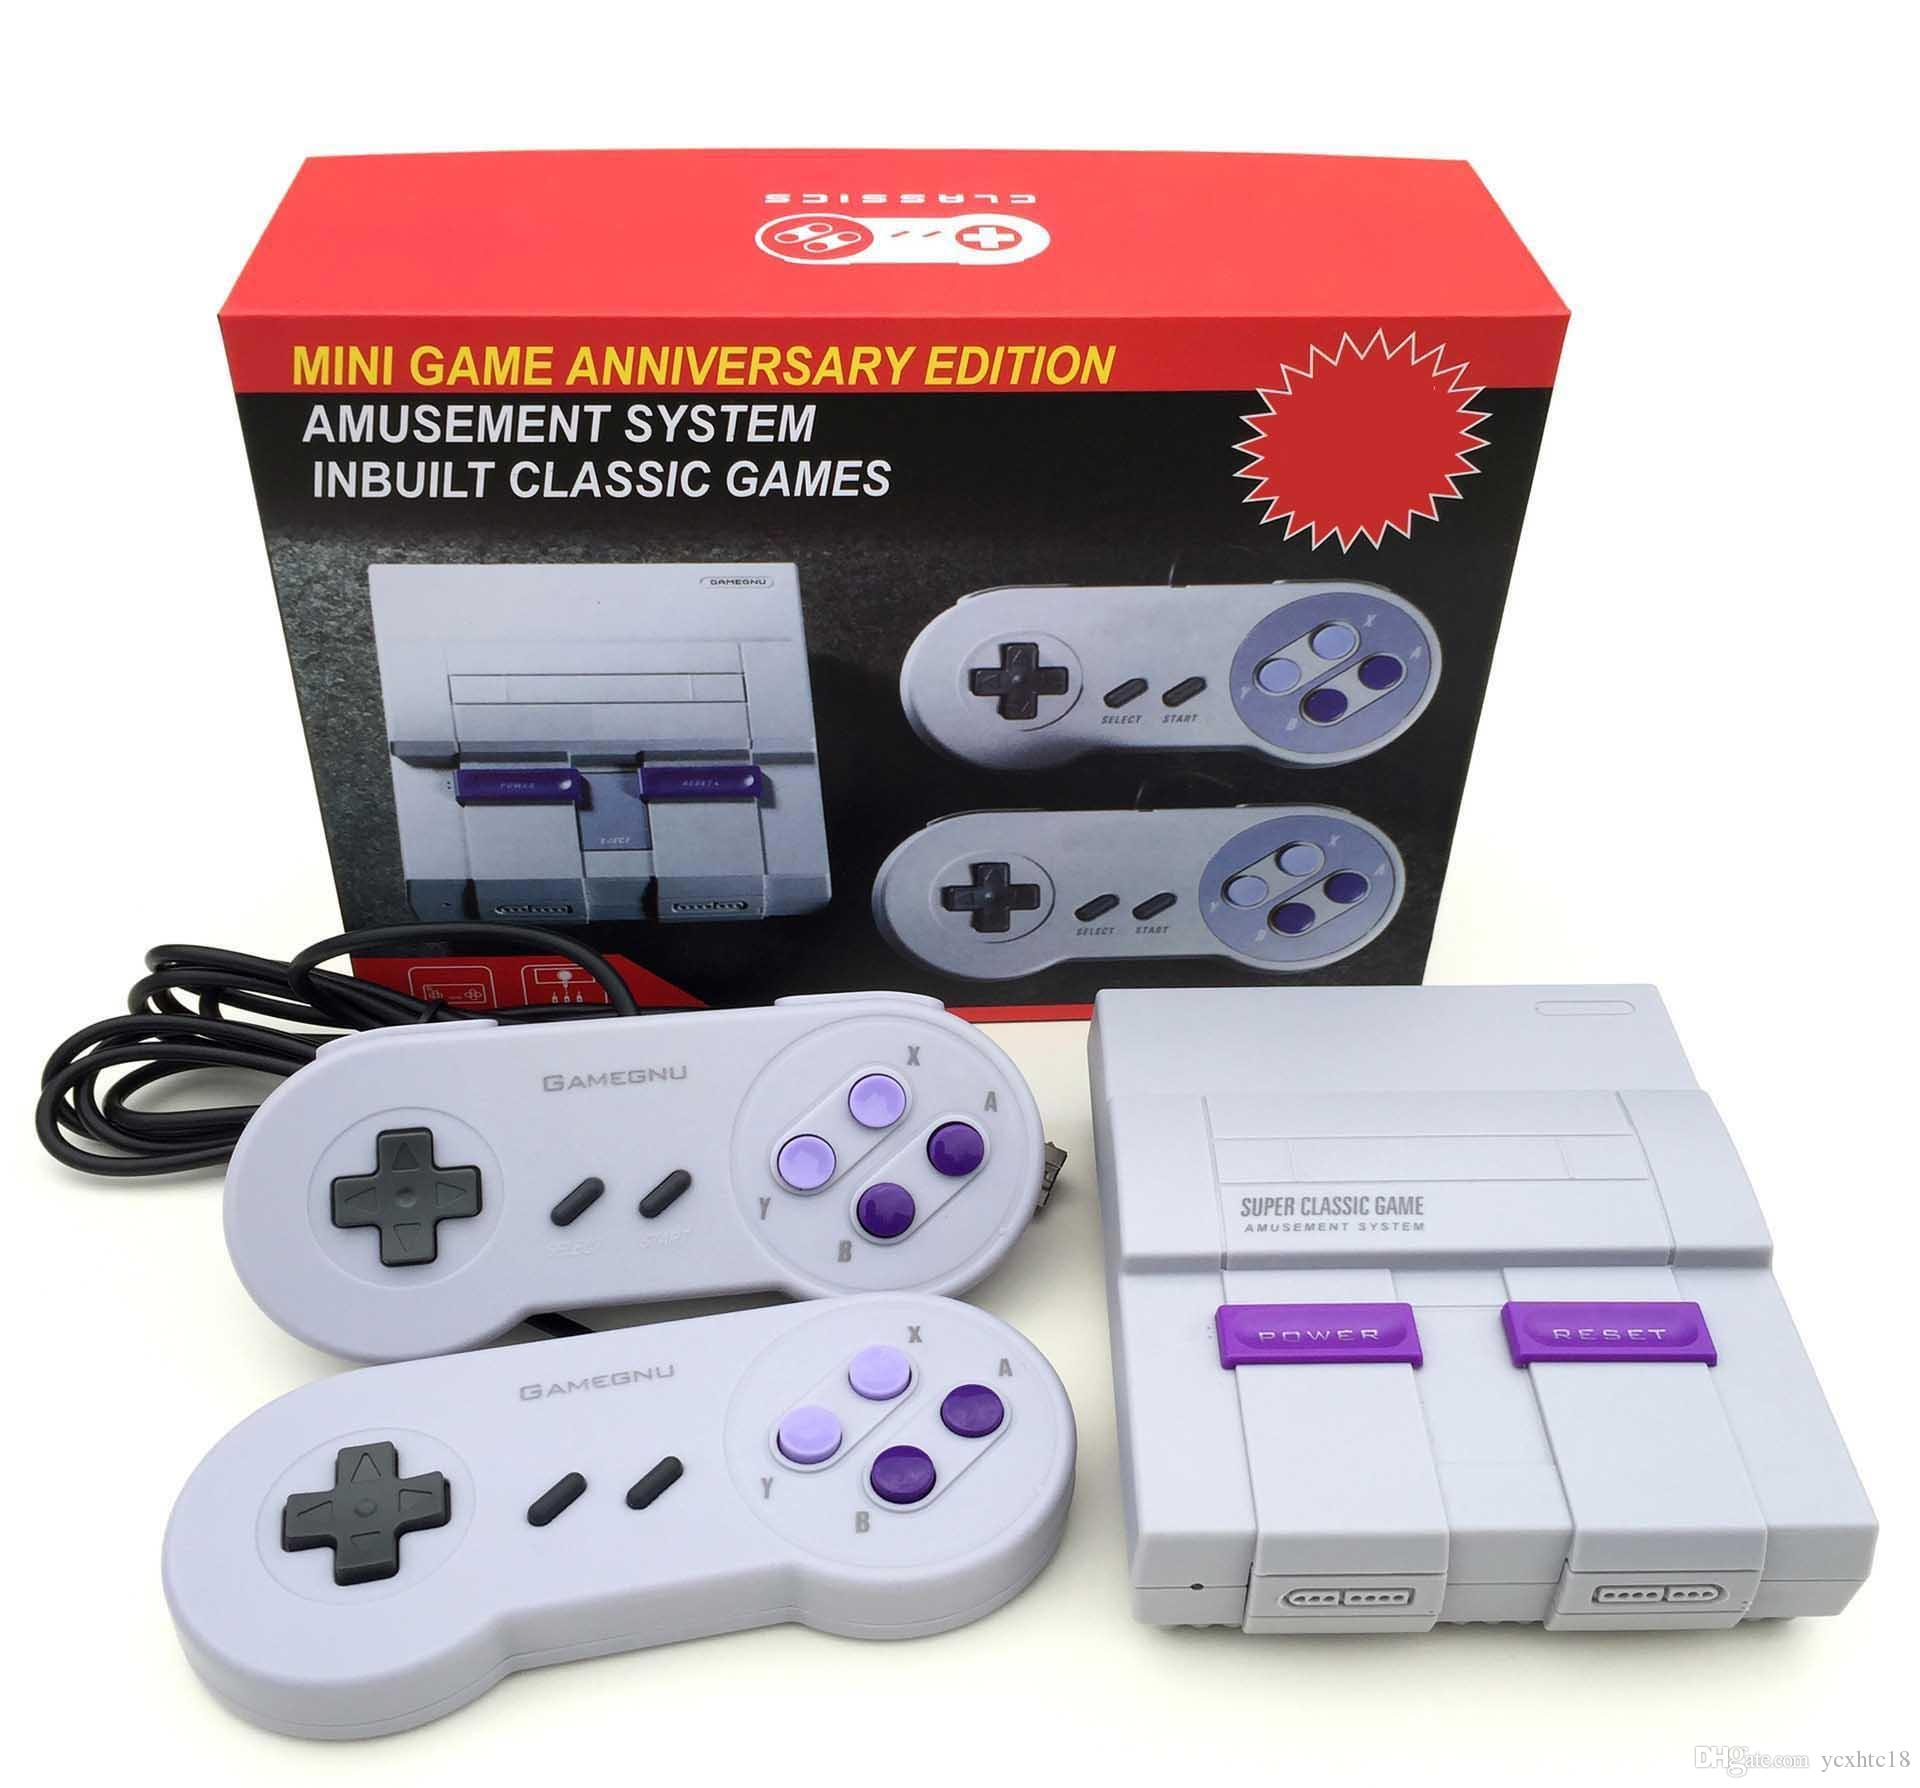 NES Super Classic Snes gry TV wideo Handheld Retro Classic Game Console System Entertainment Również Sprzedaż PXP3 PVP